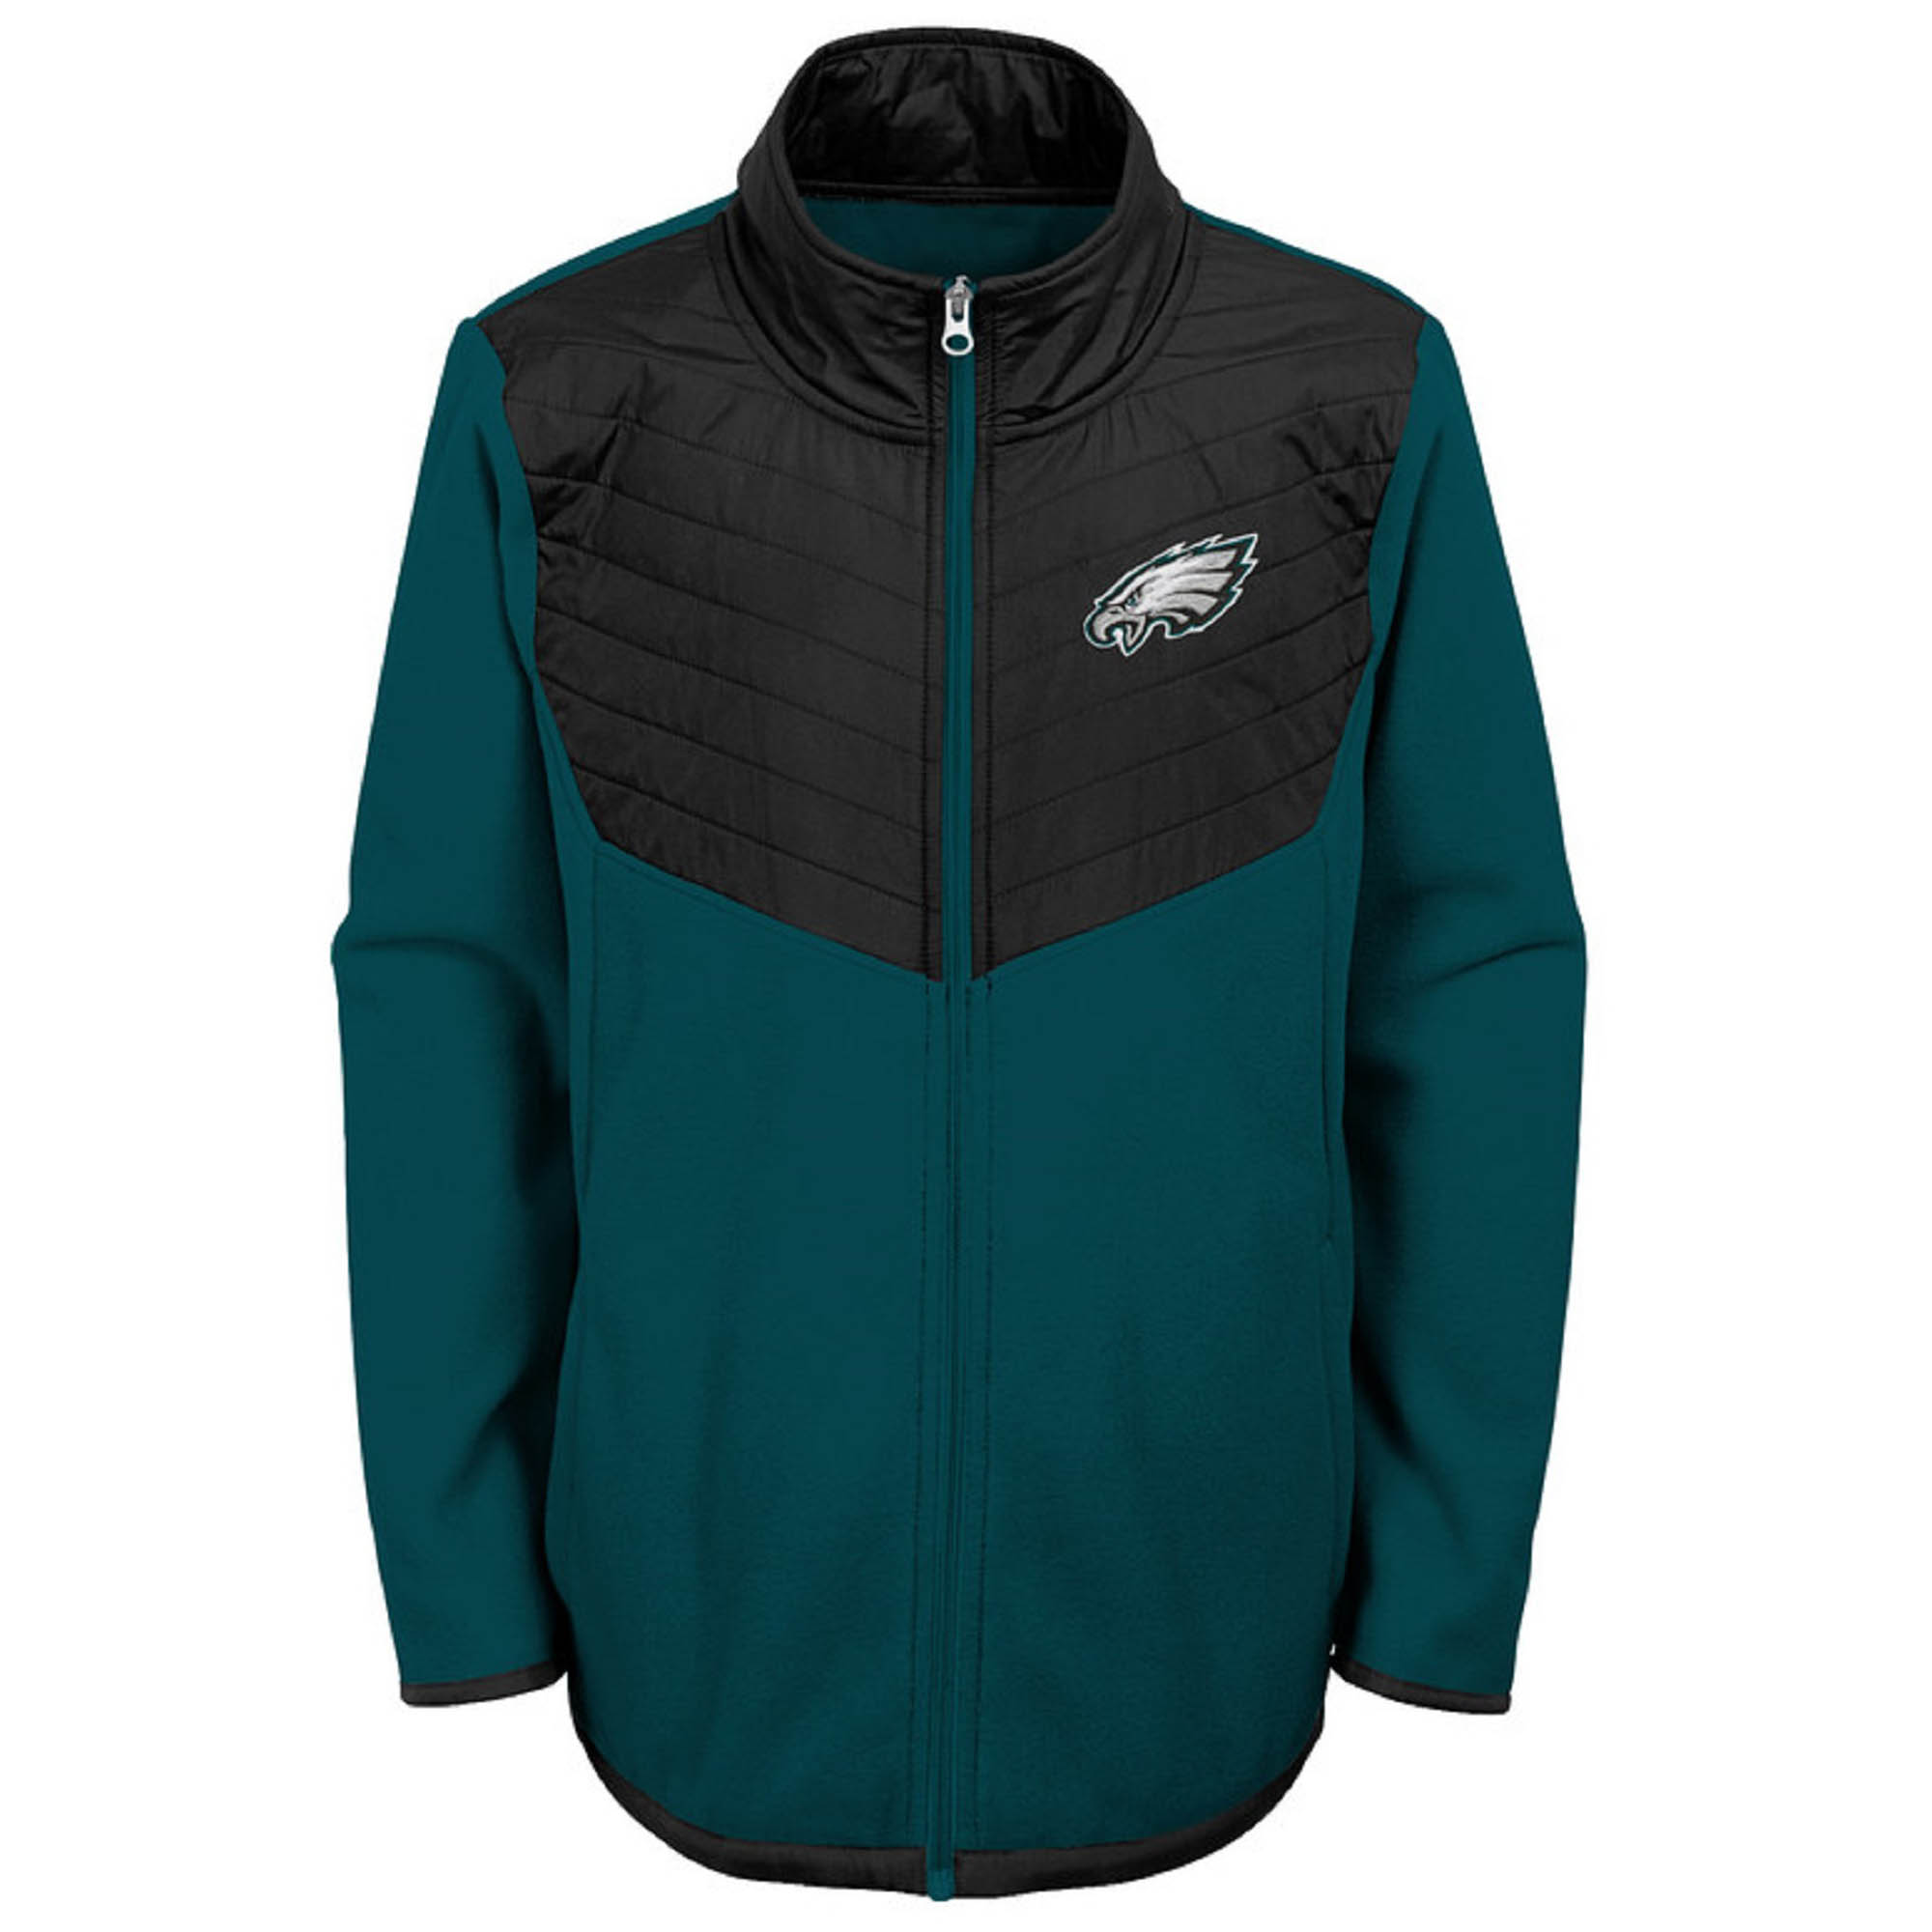 Youth Midnight Green/Black Philadelphia Eagles Polar Full-Zip Jacket